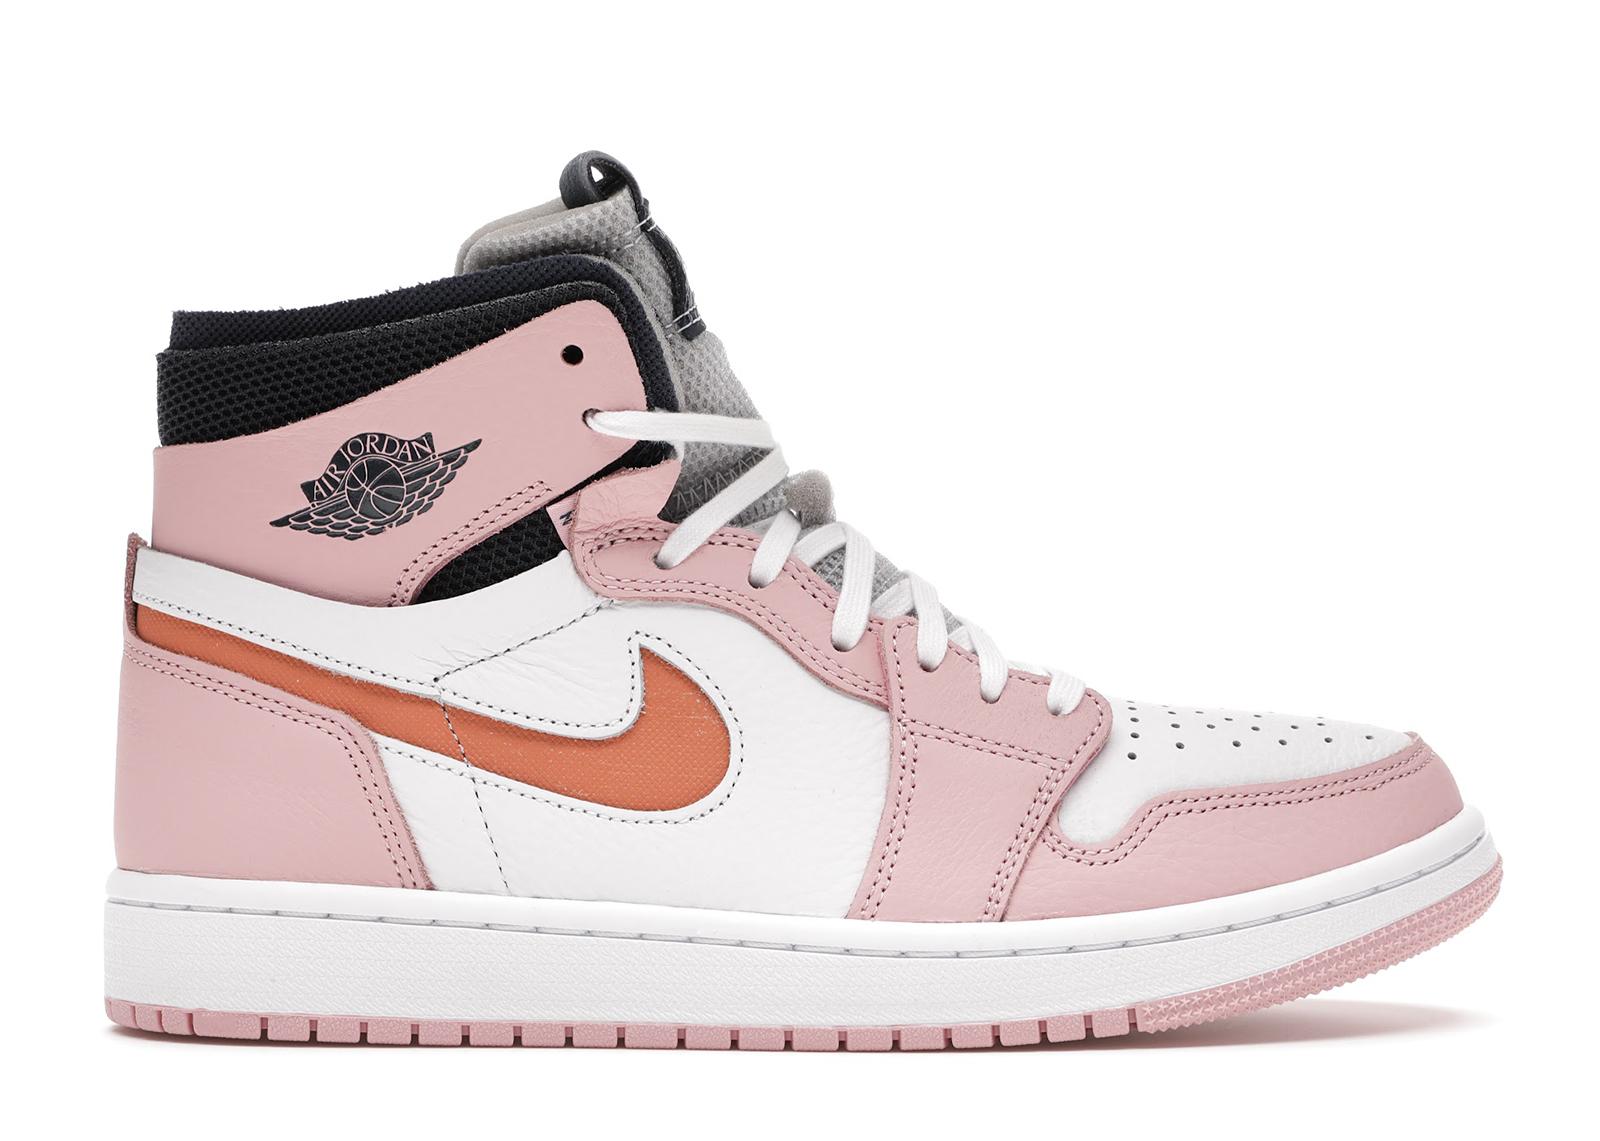 Buy Air Jordan 1 Women Shoes & Deadstock Sneakers